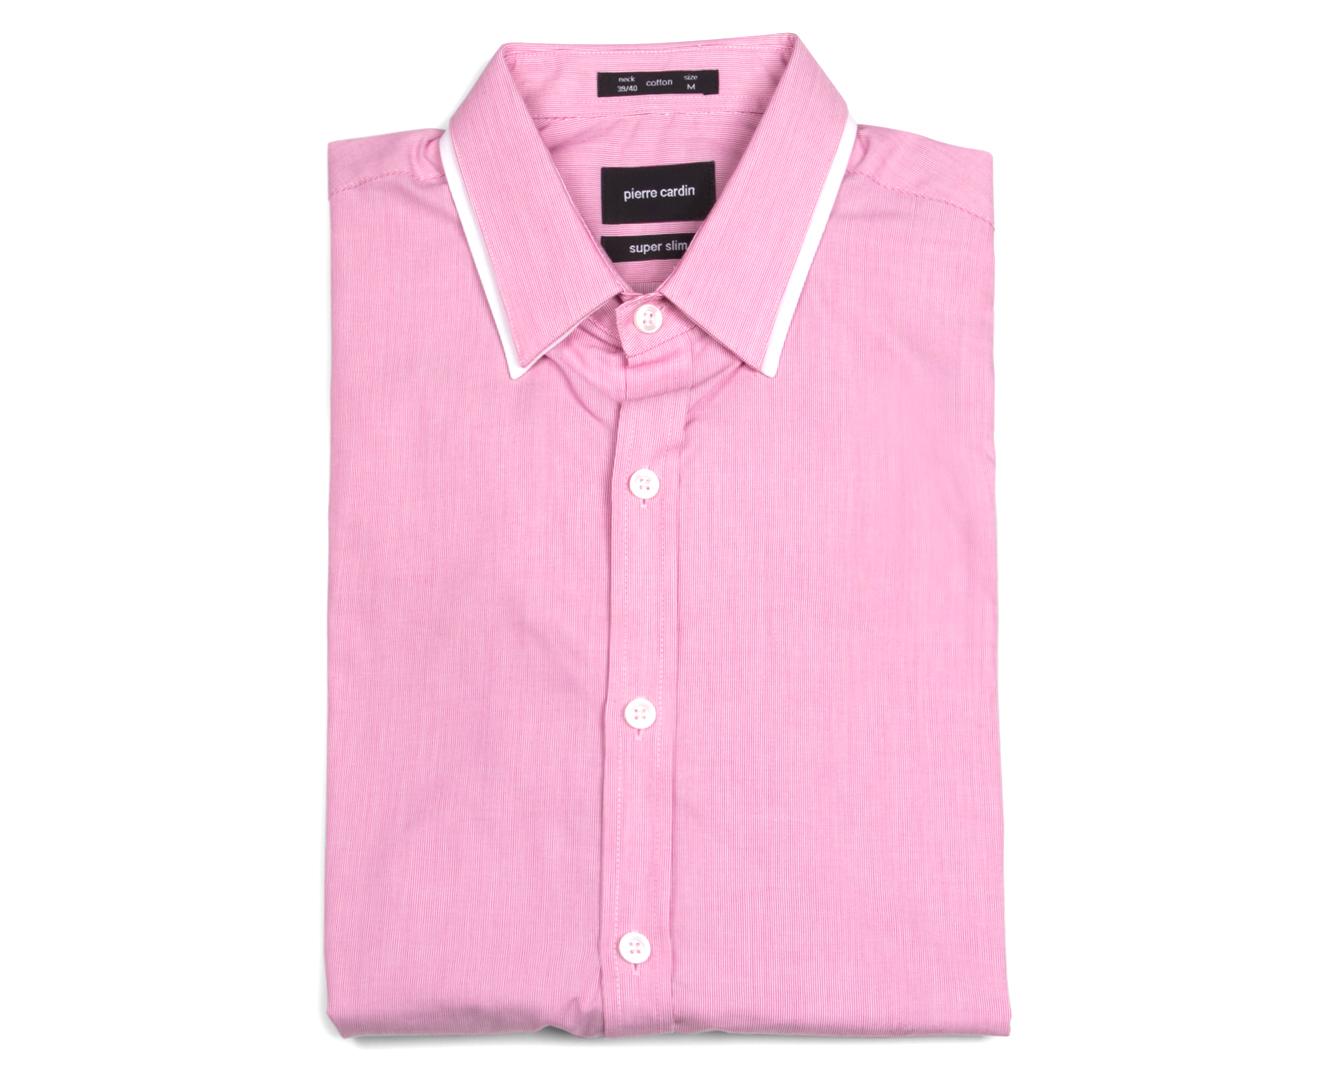 Pierre Cardin Mens Pinstripe Shirt Candy Pink Catch